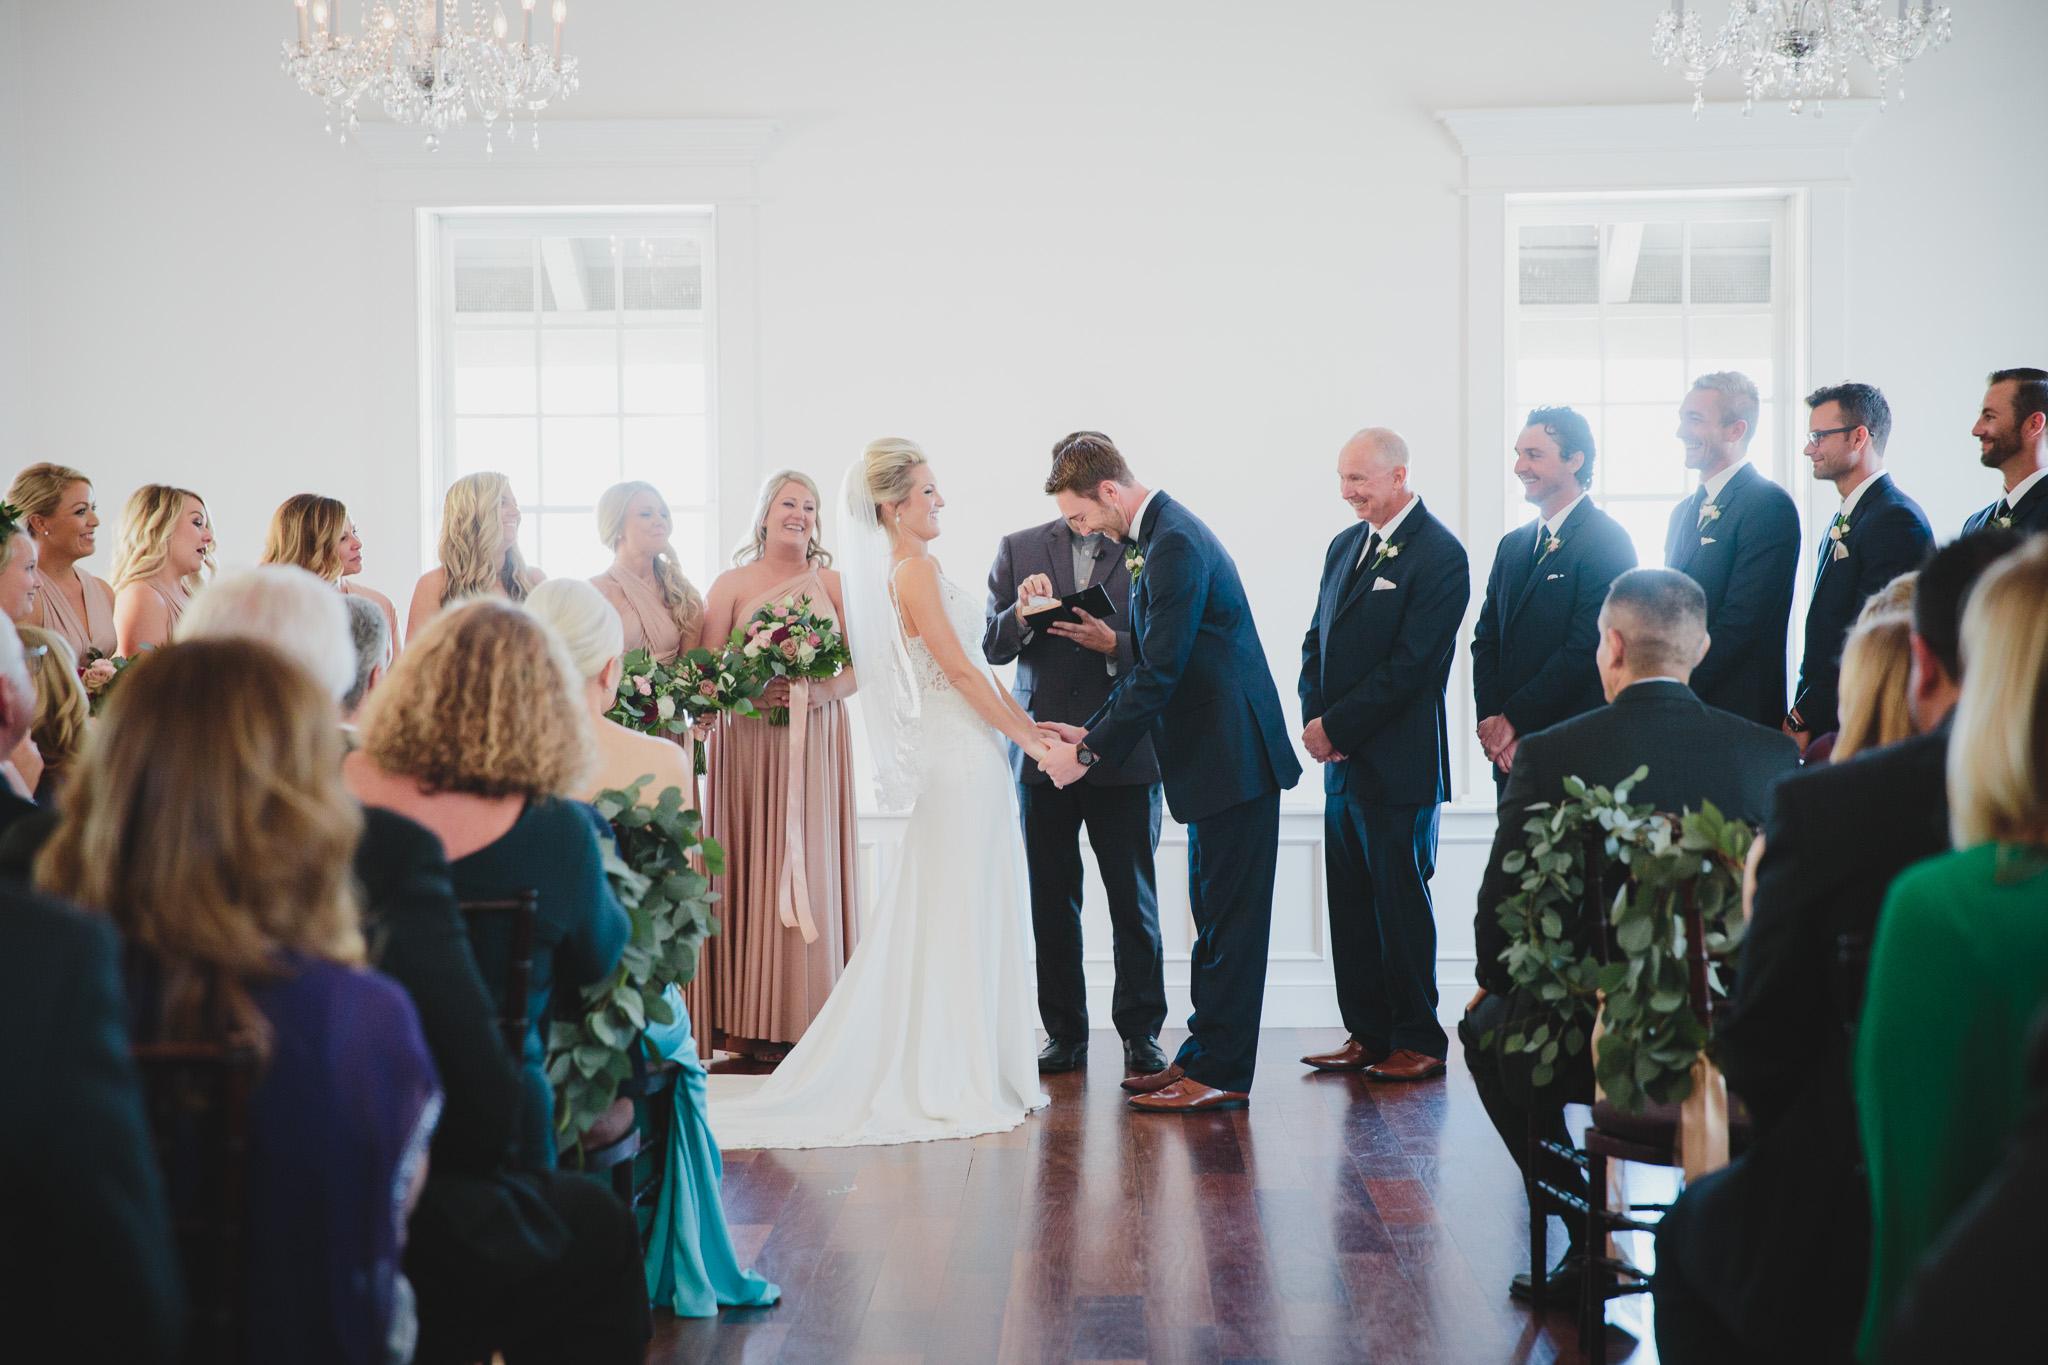 st-augustine-white-room-ceremony-villa-blanca-florida-weddings